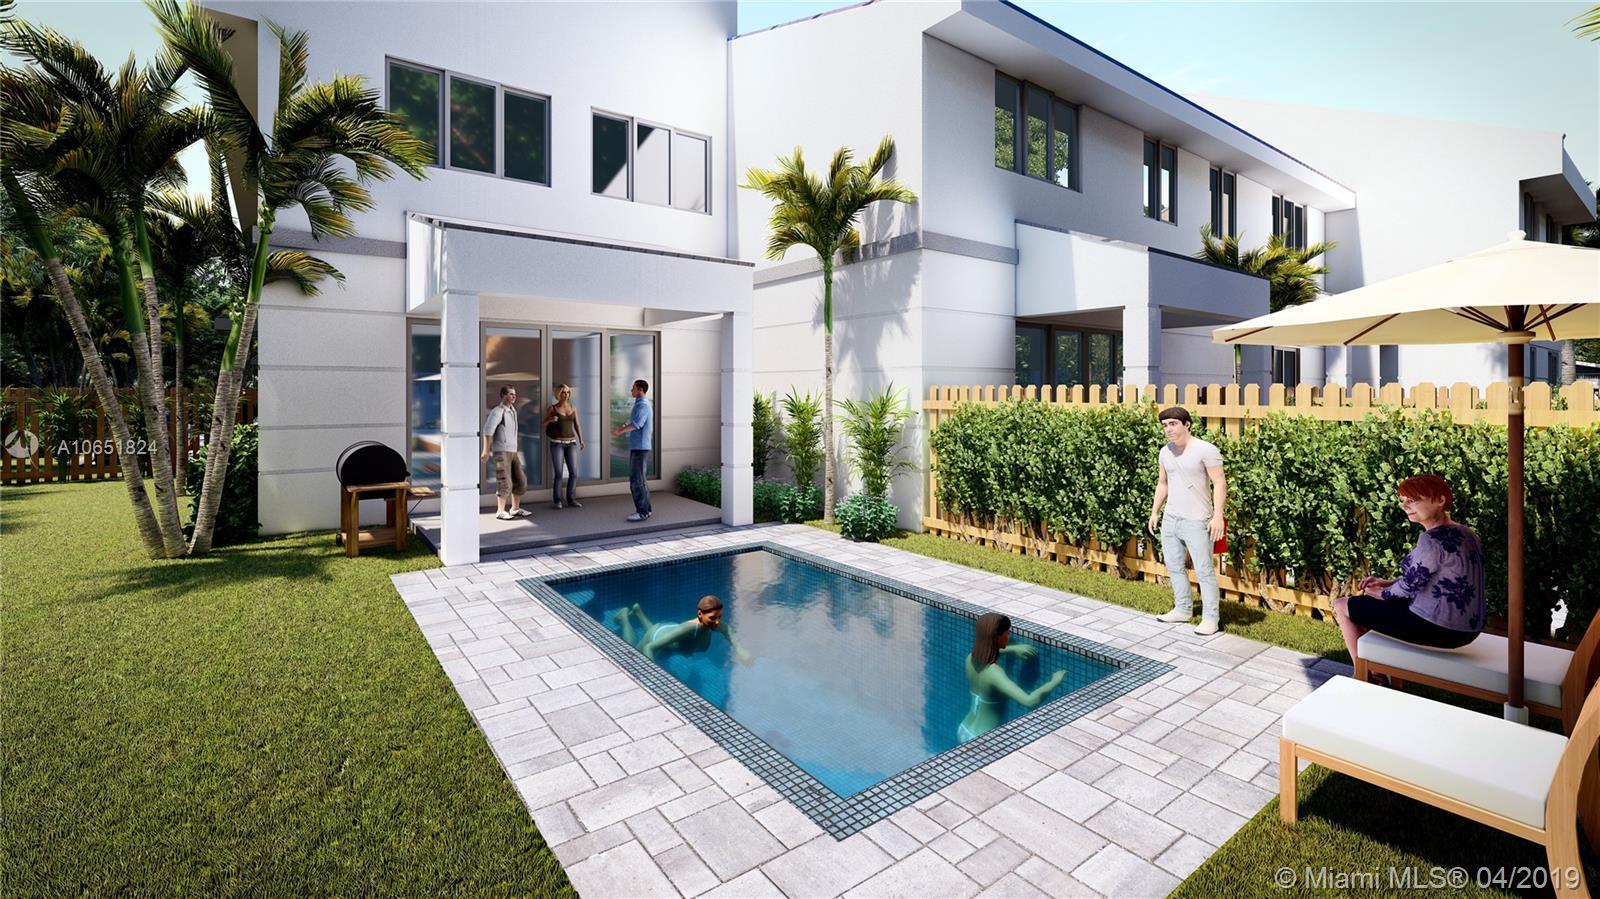 1118 NE 14th Ave #E Property Photo - Fort Lauderdale, FL real estate listing